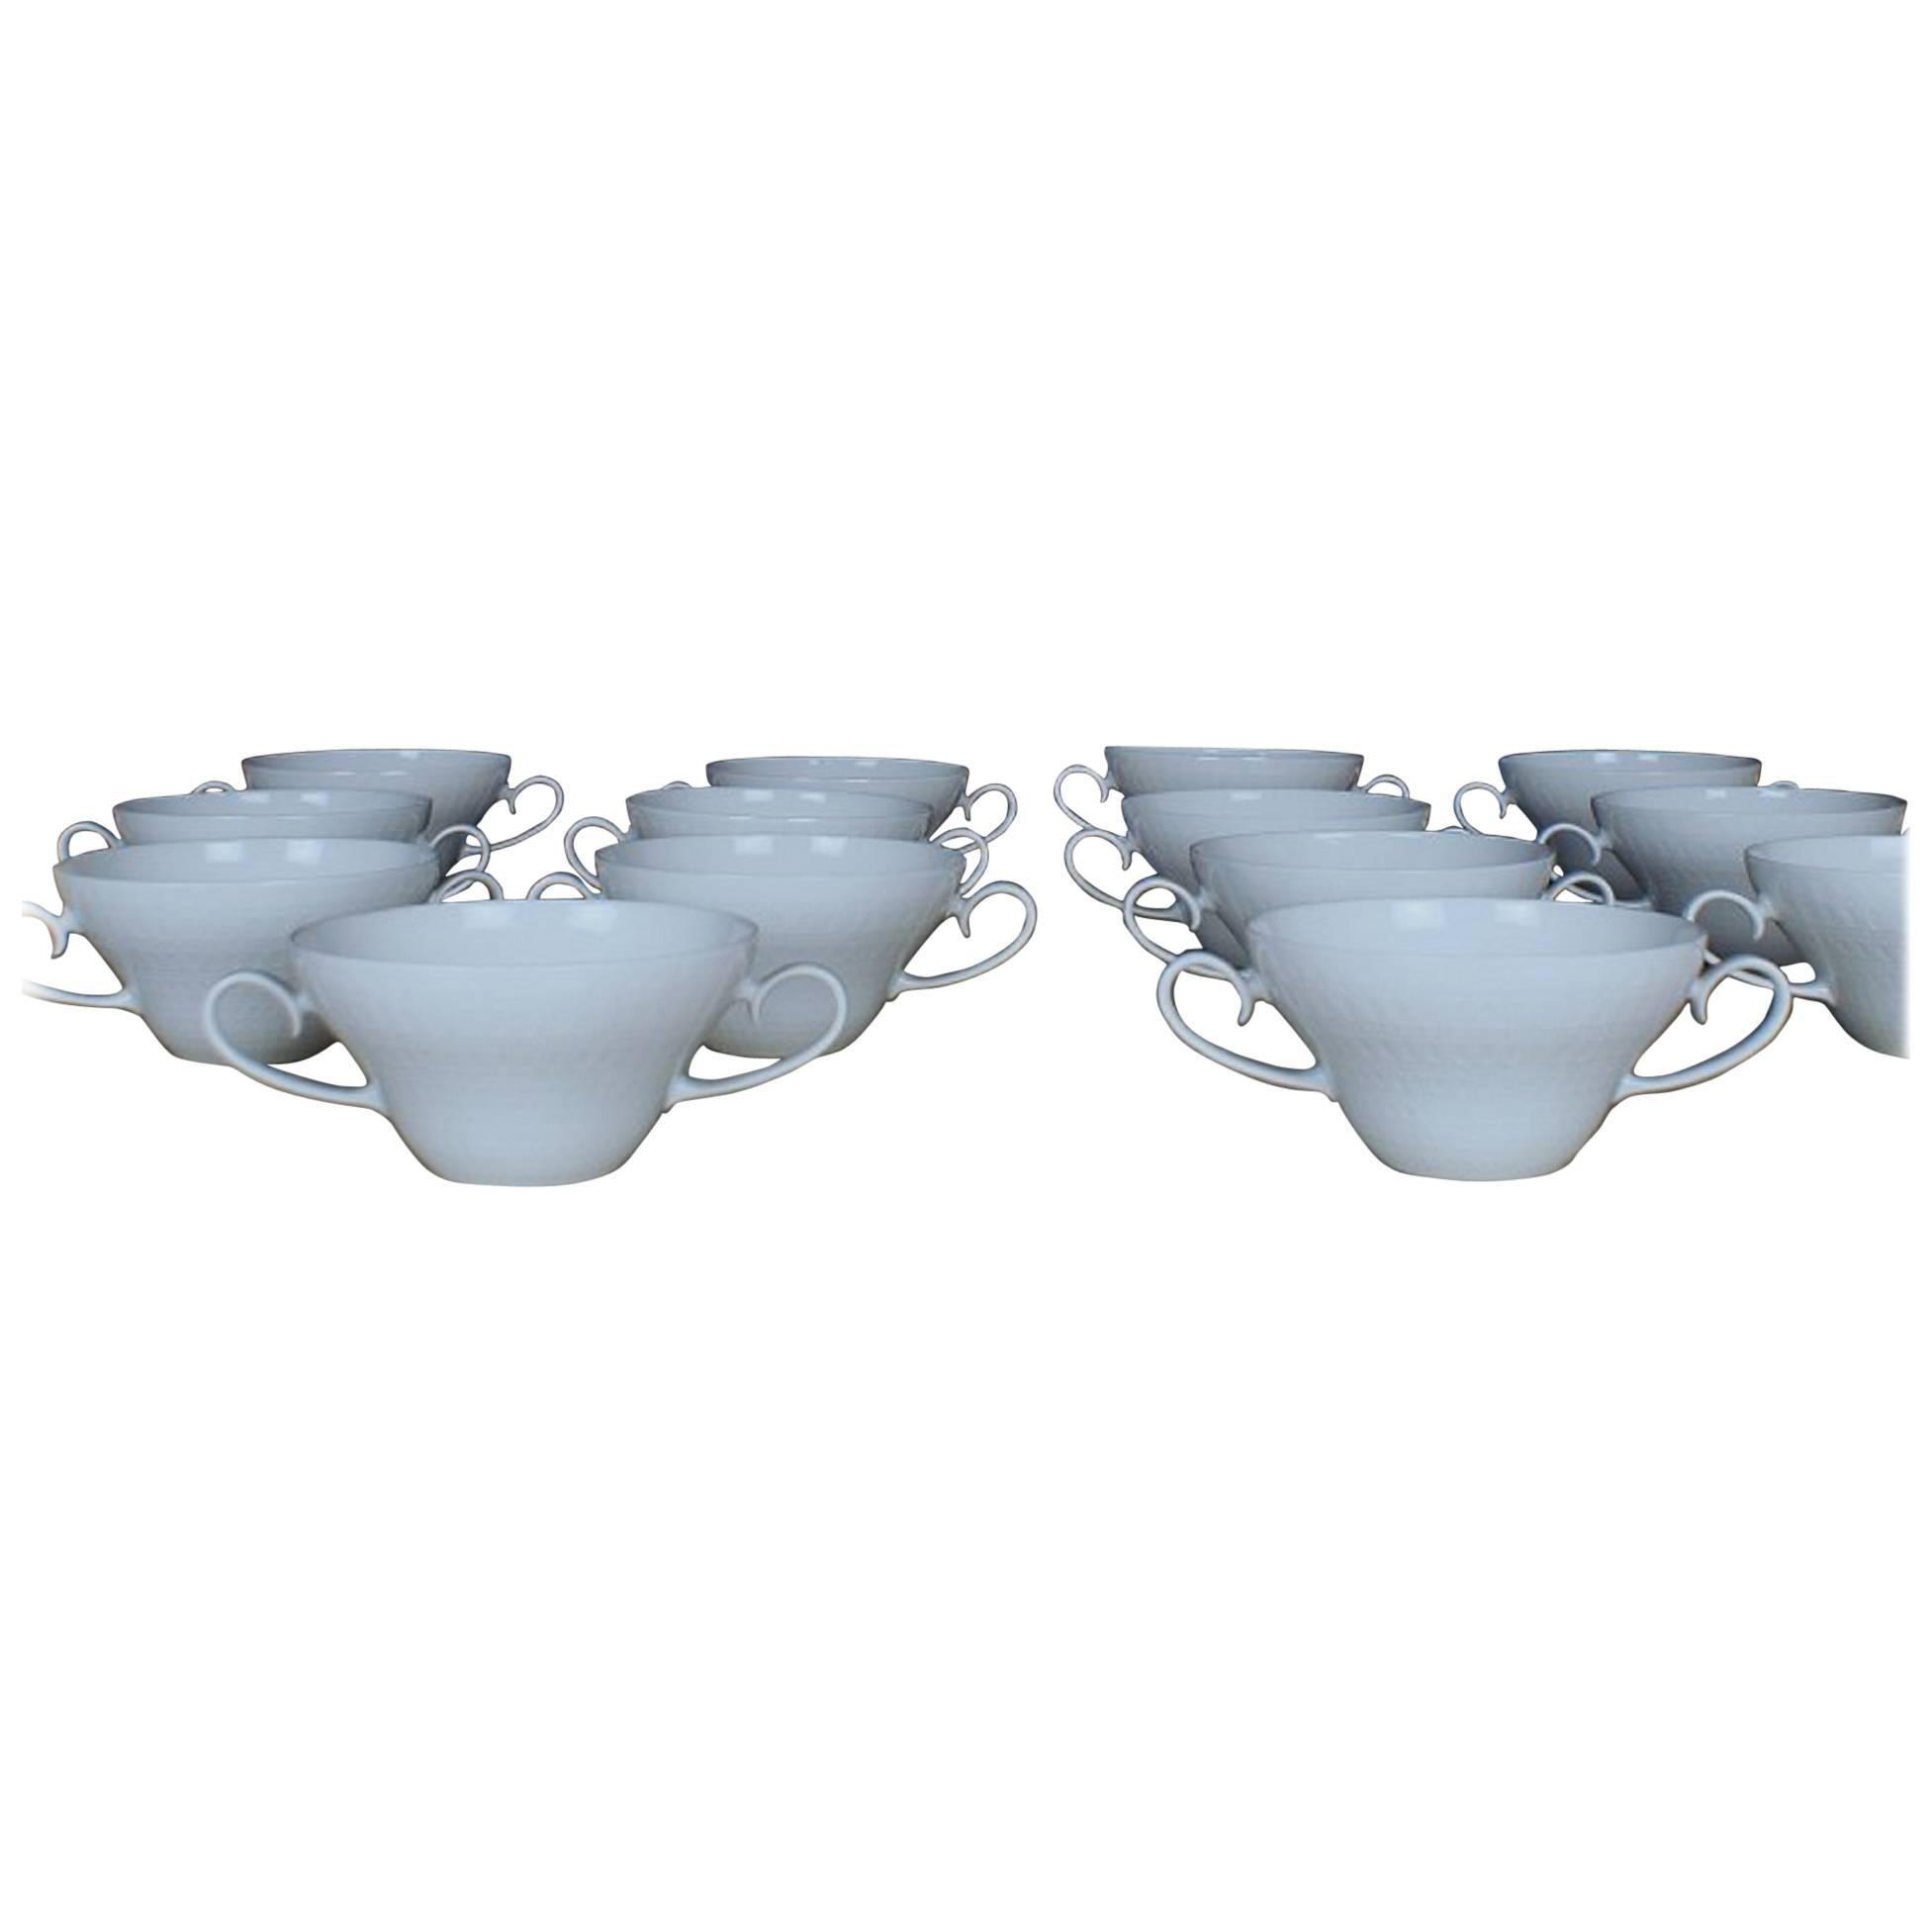 Rosenthal Bjorn Wiinblad 14 Bouillon Cups